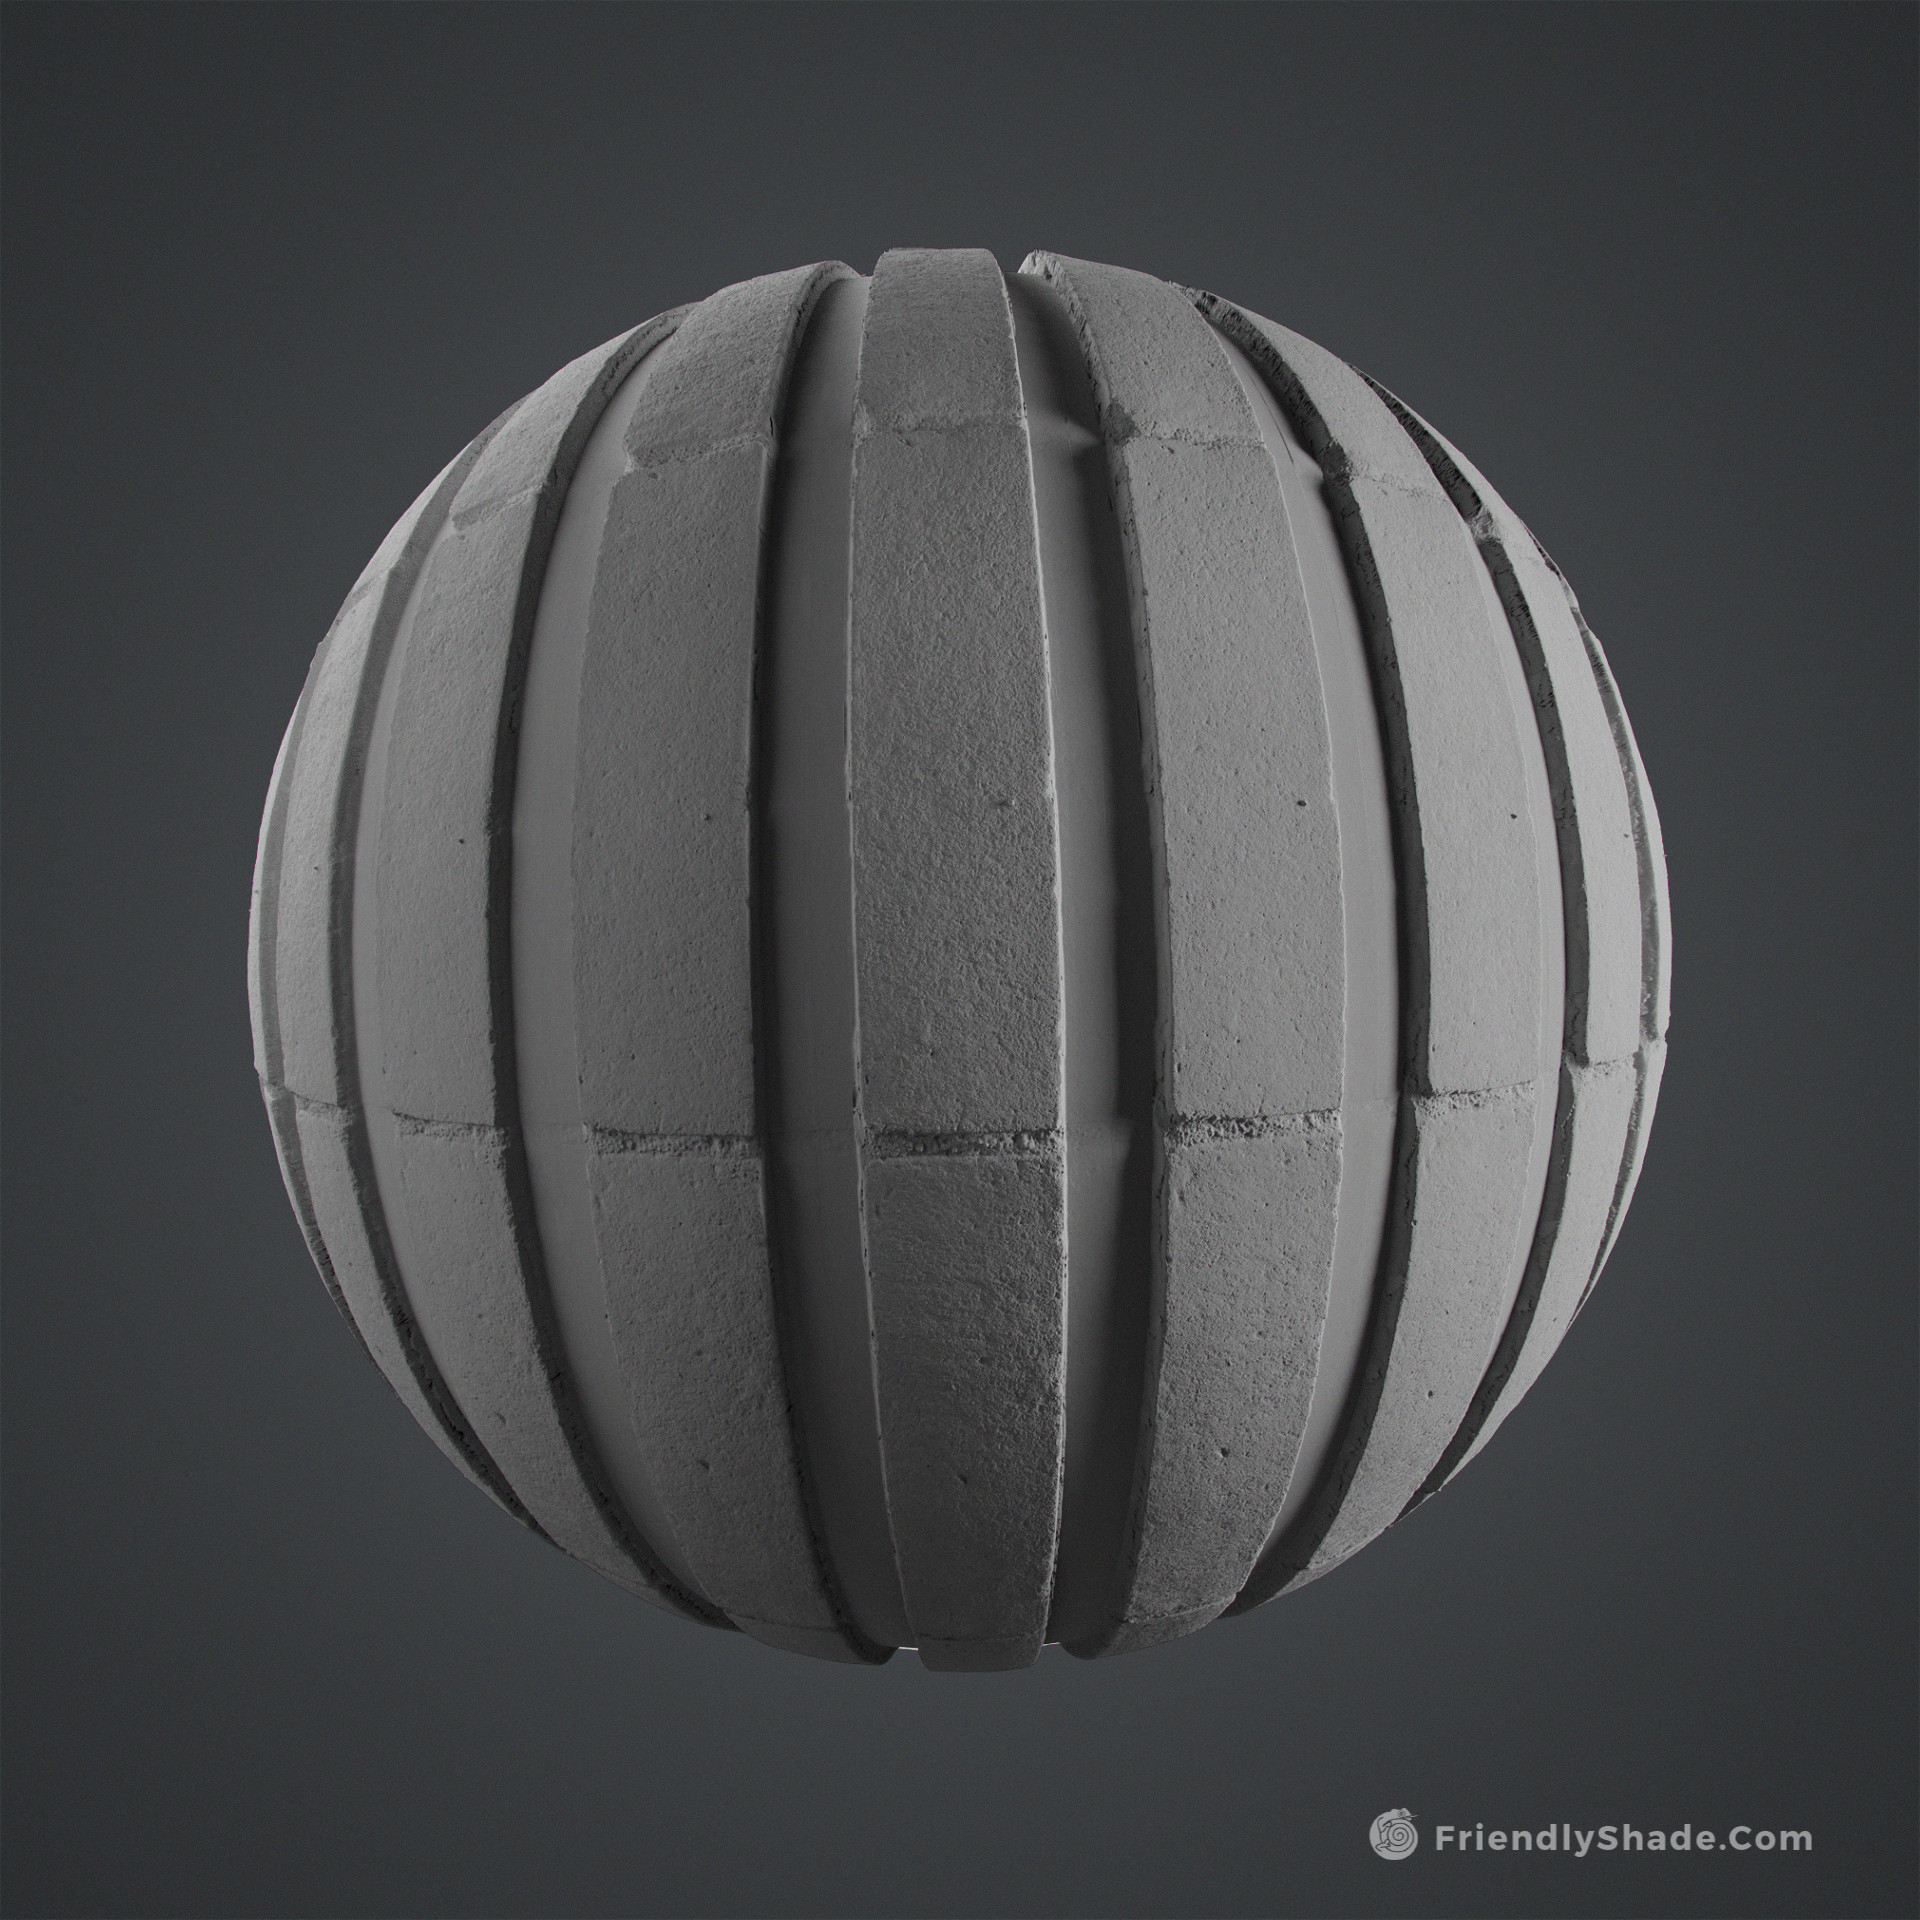 https://cdna.artstation.com/p/assets/images/images/007/403/914/large/sebastian-zapata-sphere-clay-post.jpg?1505911155